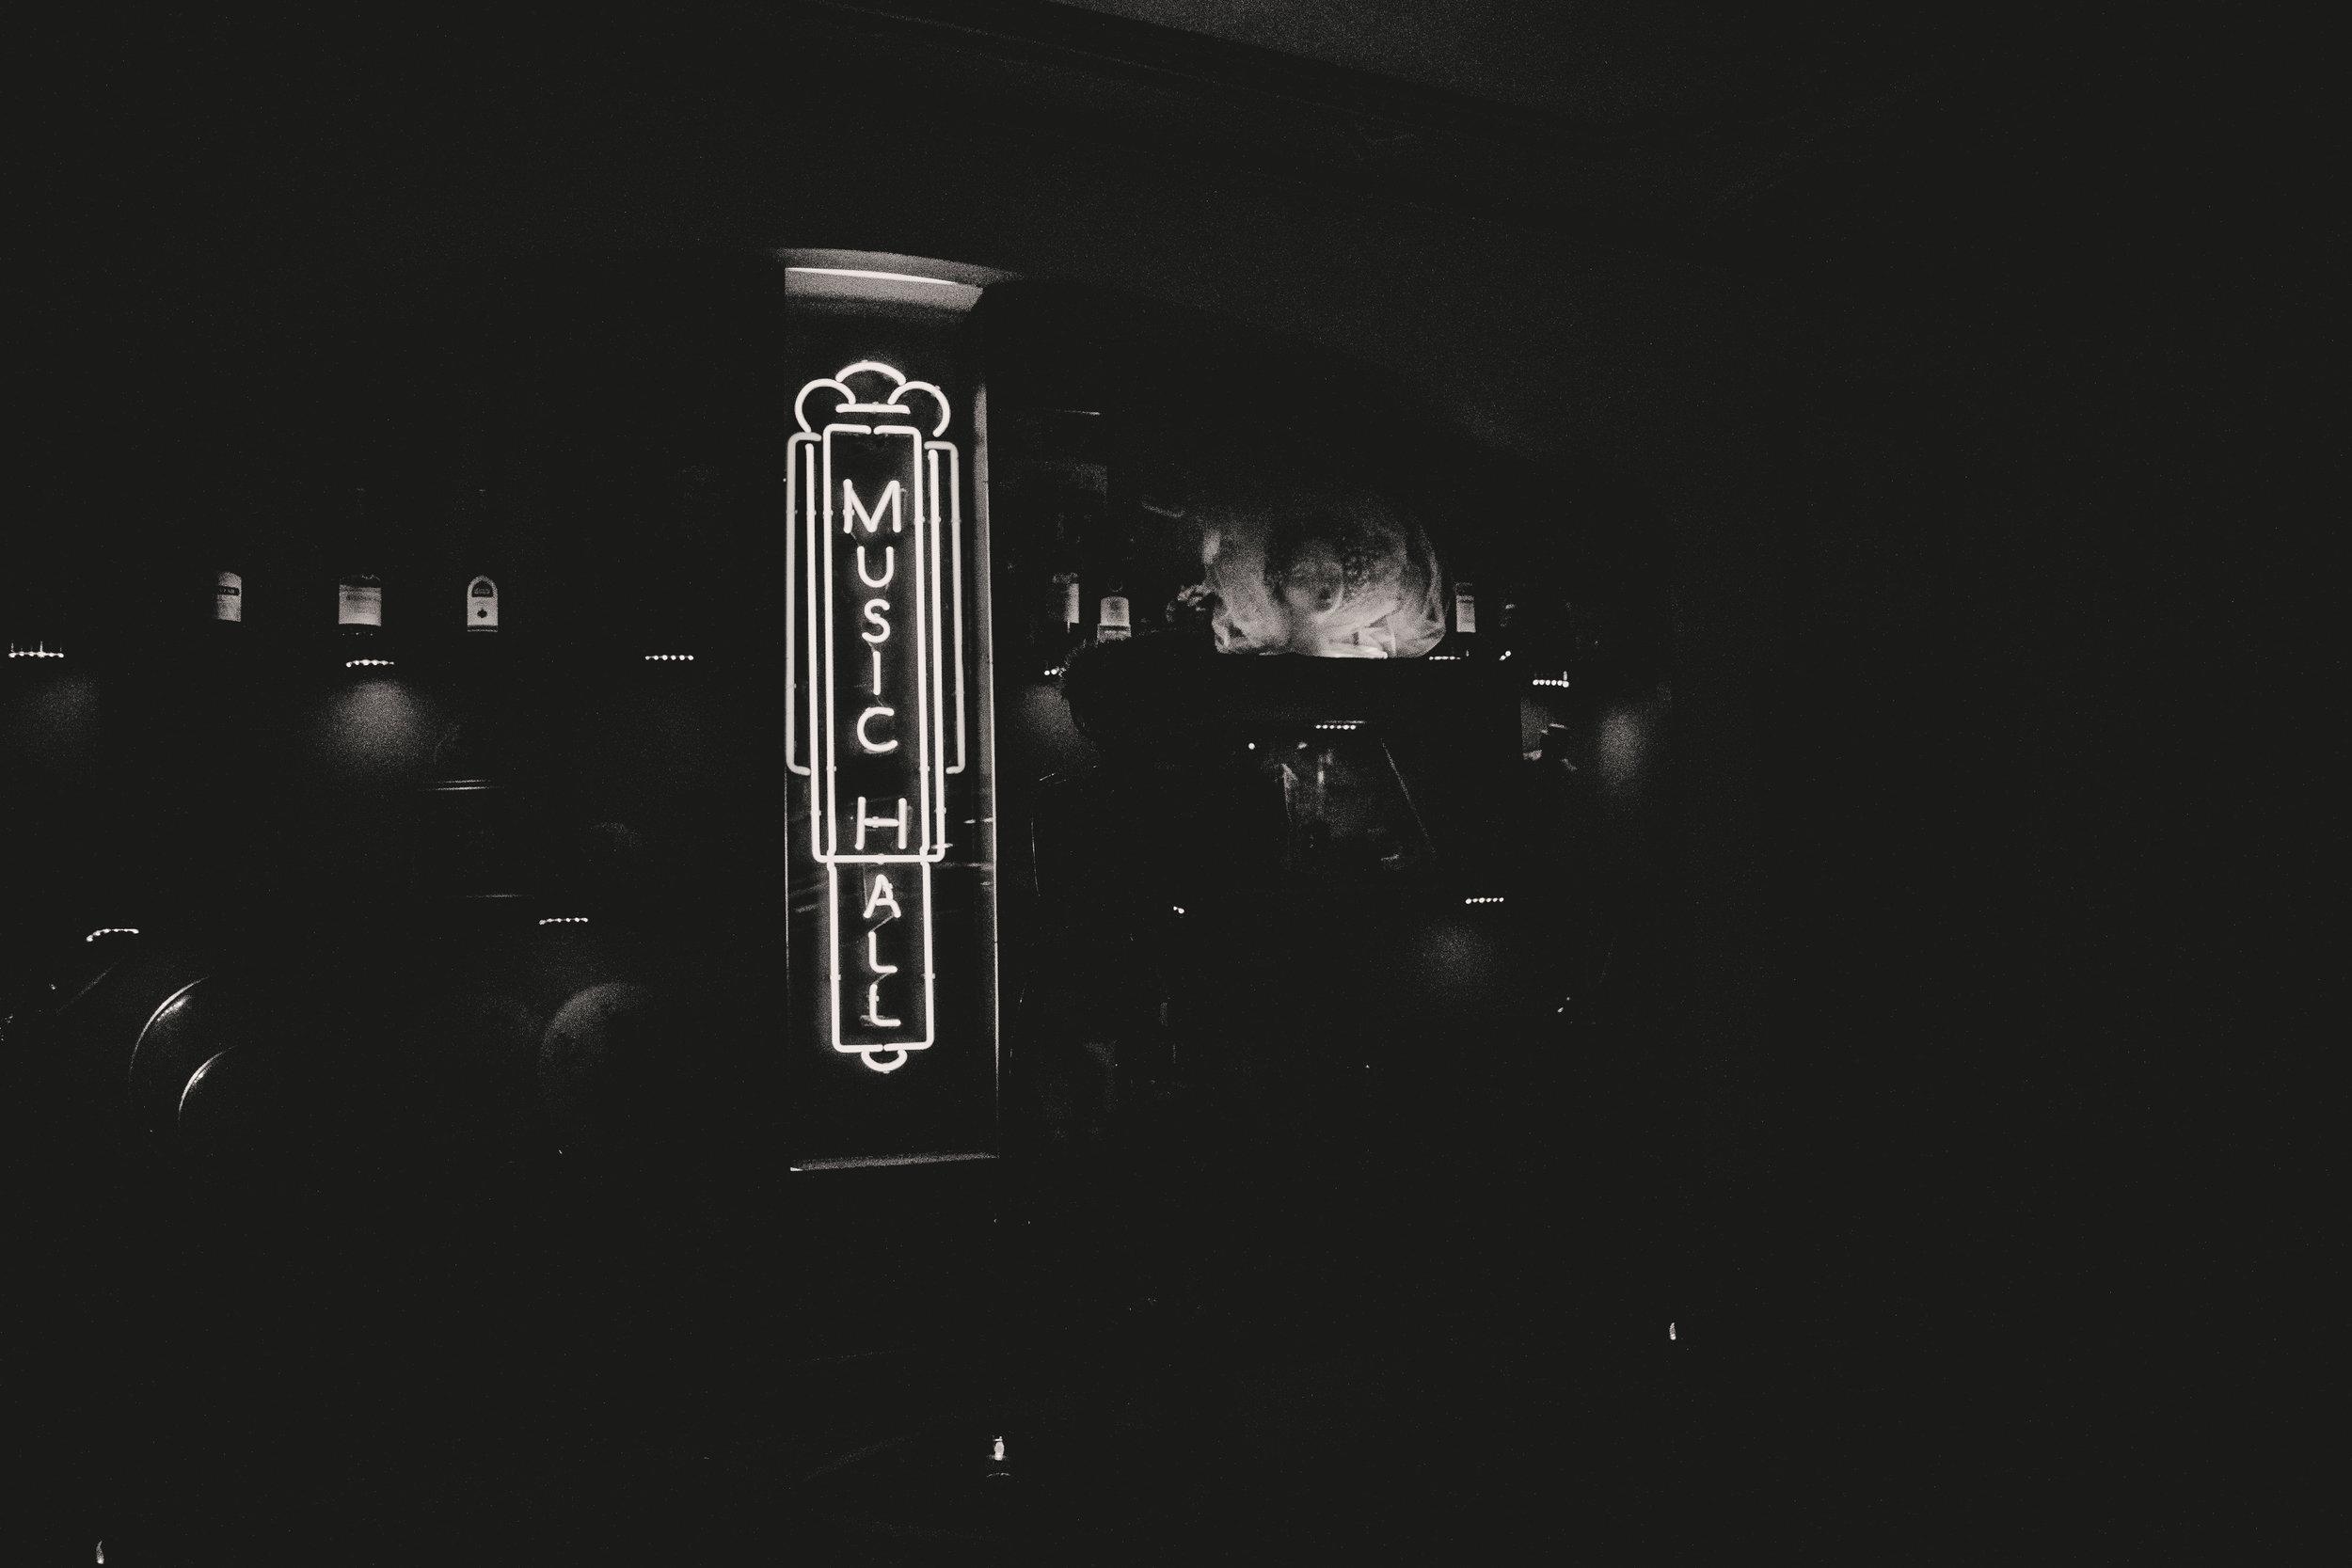 Gene-n-Tonics March 23 Jazz Cafe-20170323-08-42-41.JPG